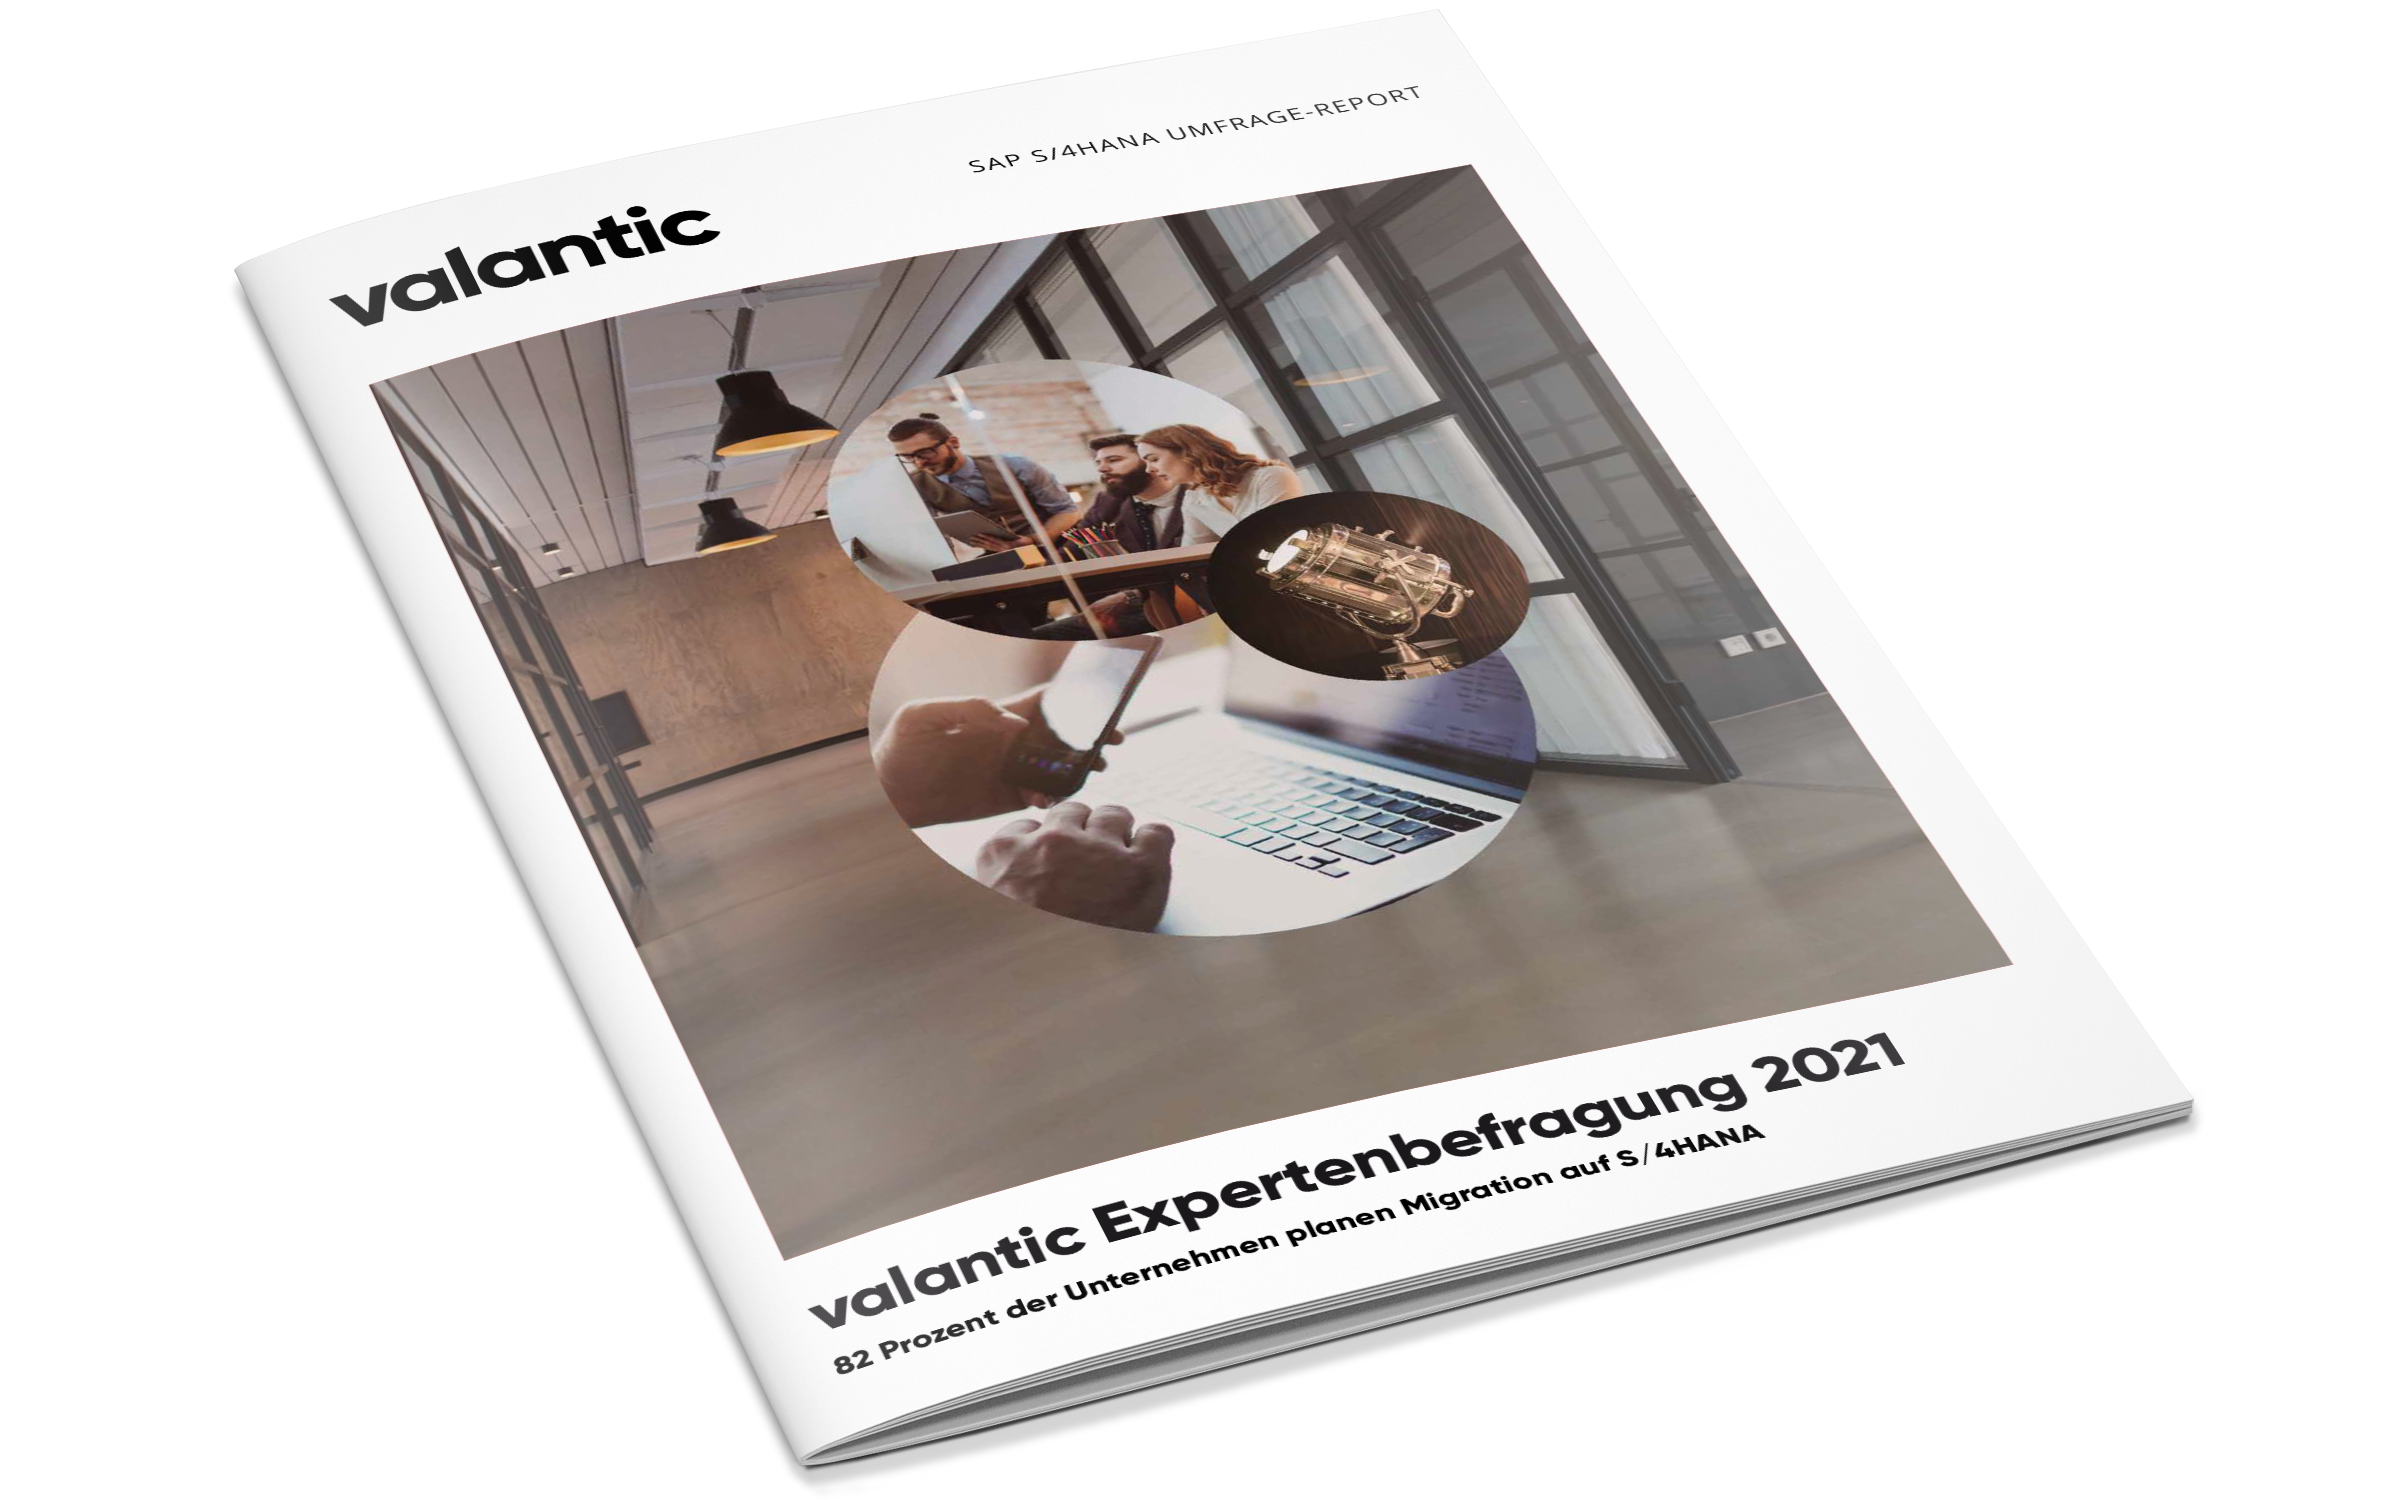 Cover des Studien-Reports zu valantics SAP S/4HANA Expertenbefragung